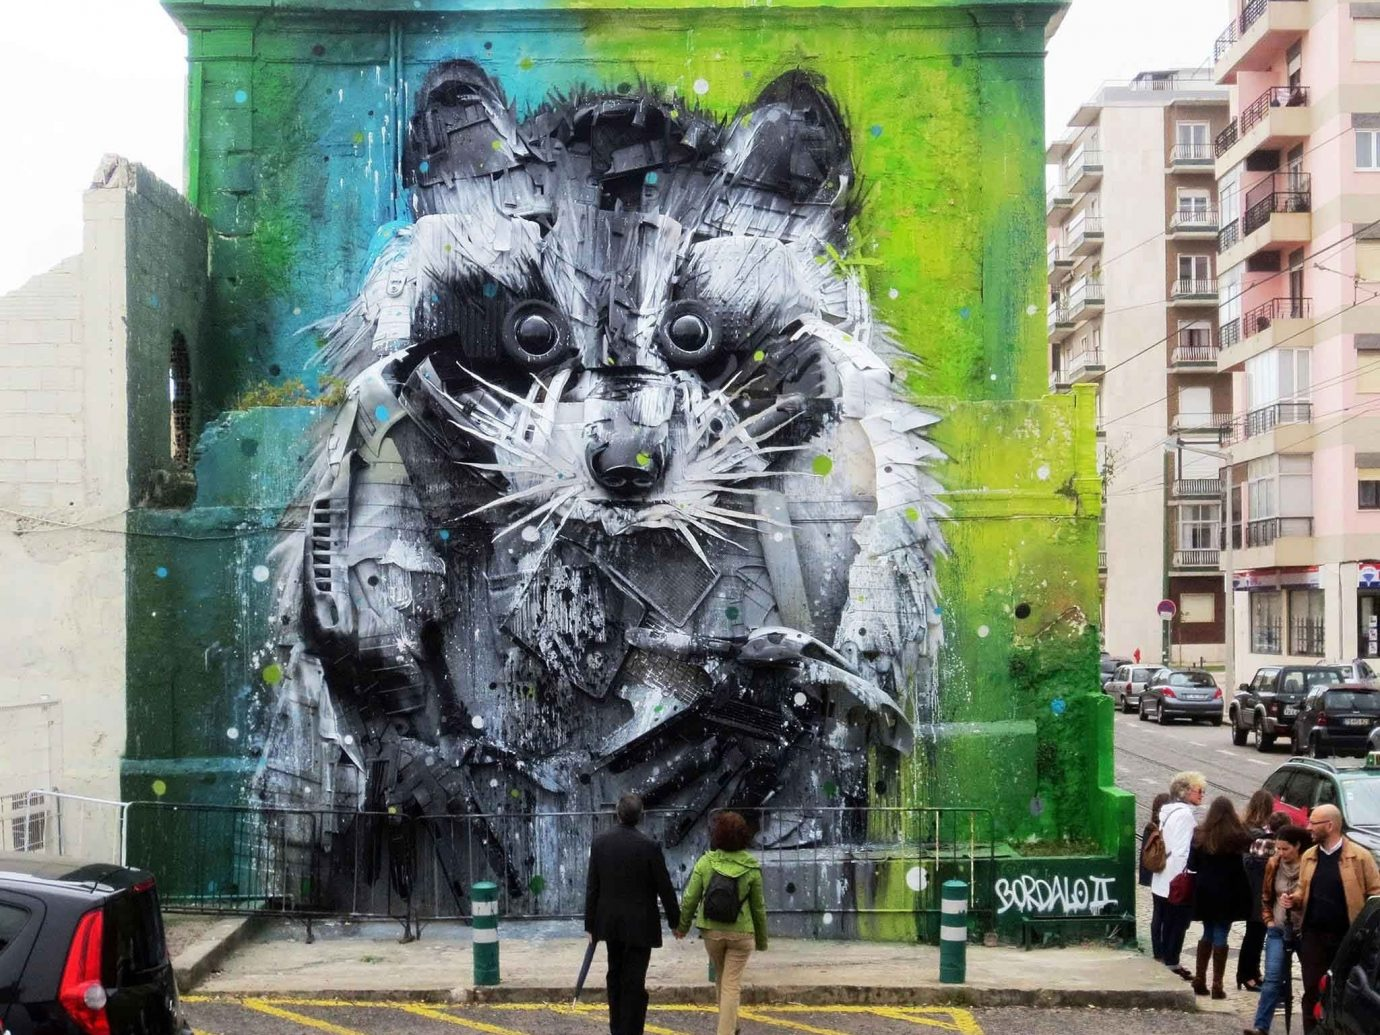 Arts + Culture building outdoor street art art walking mural graffiti